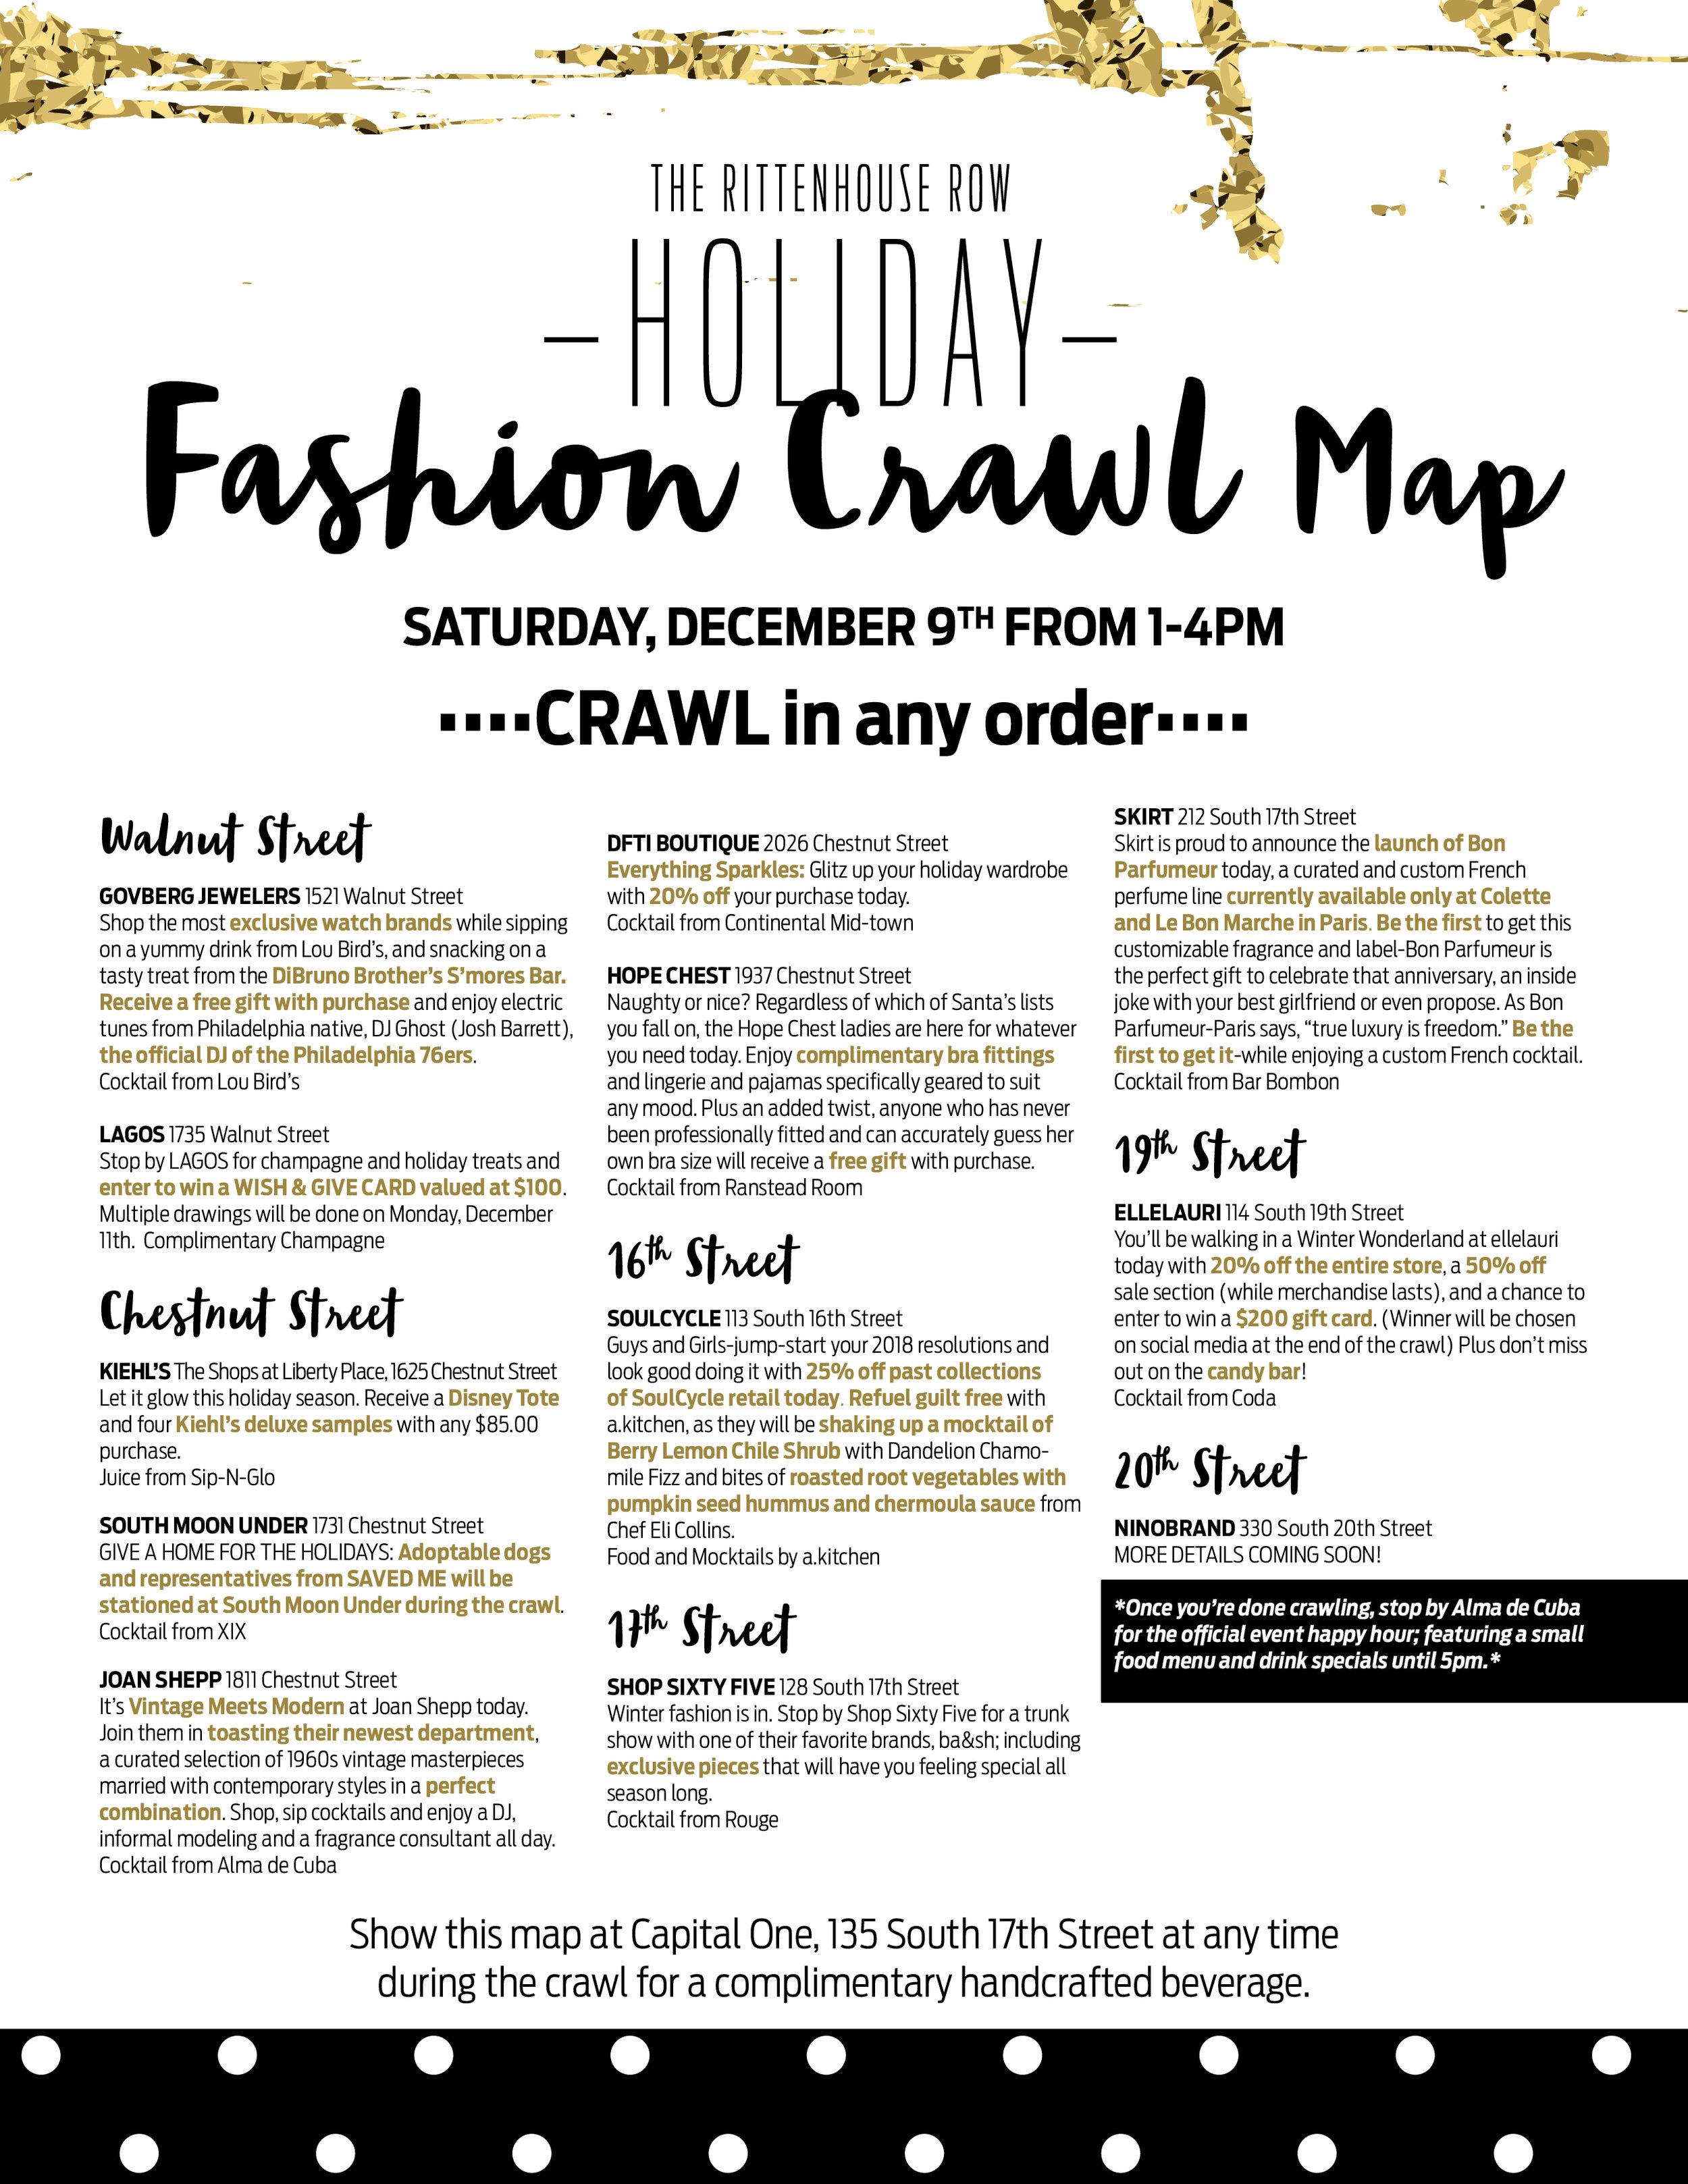 RR17 Holiday Fashion Map.jpg